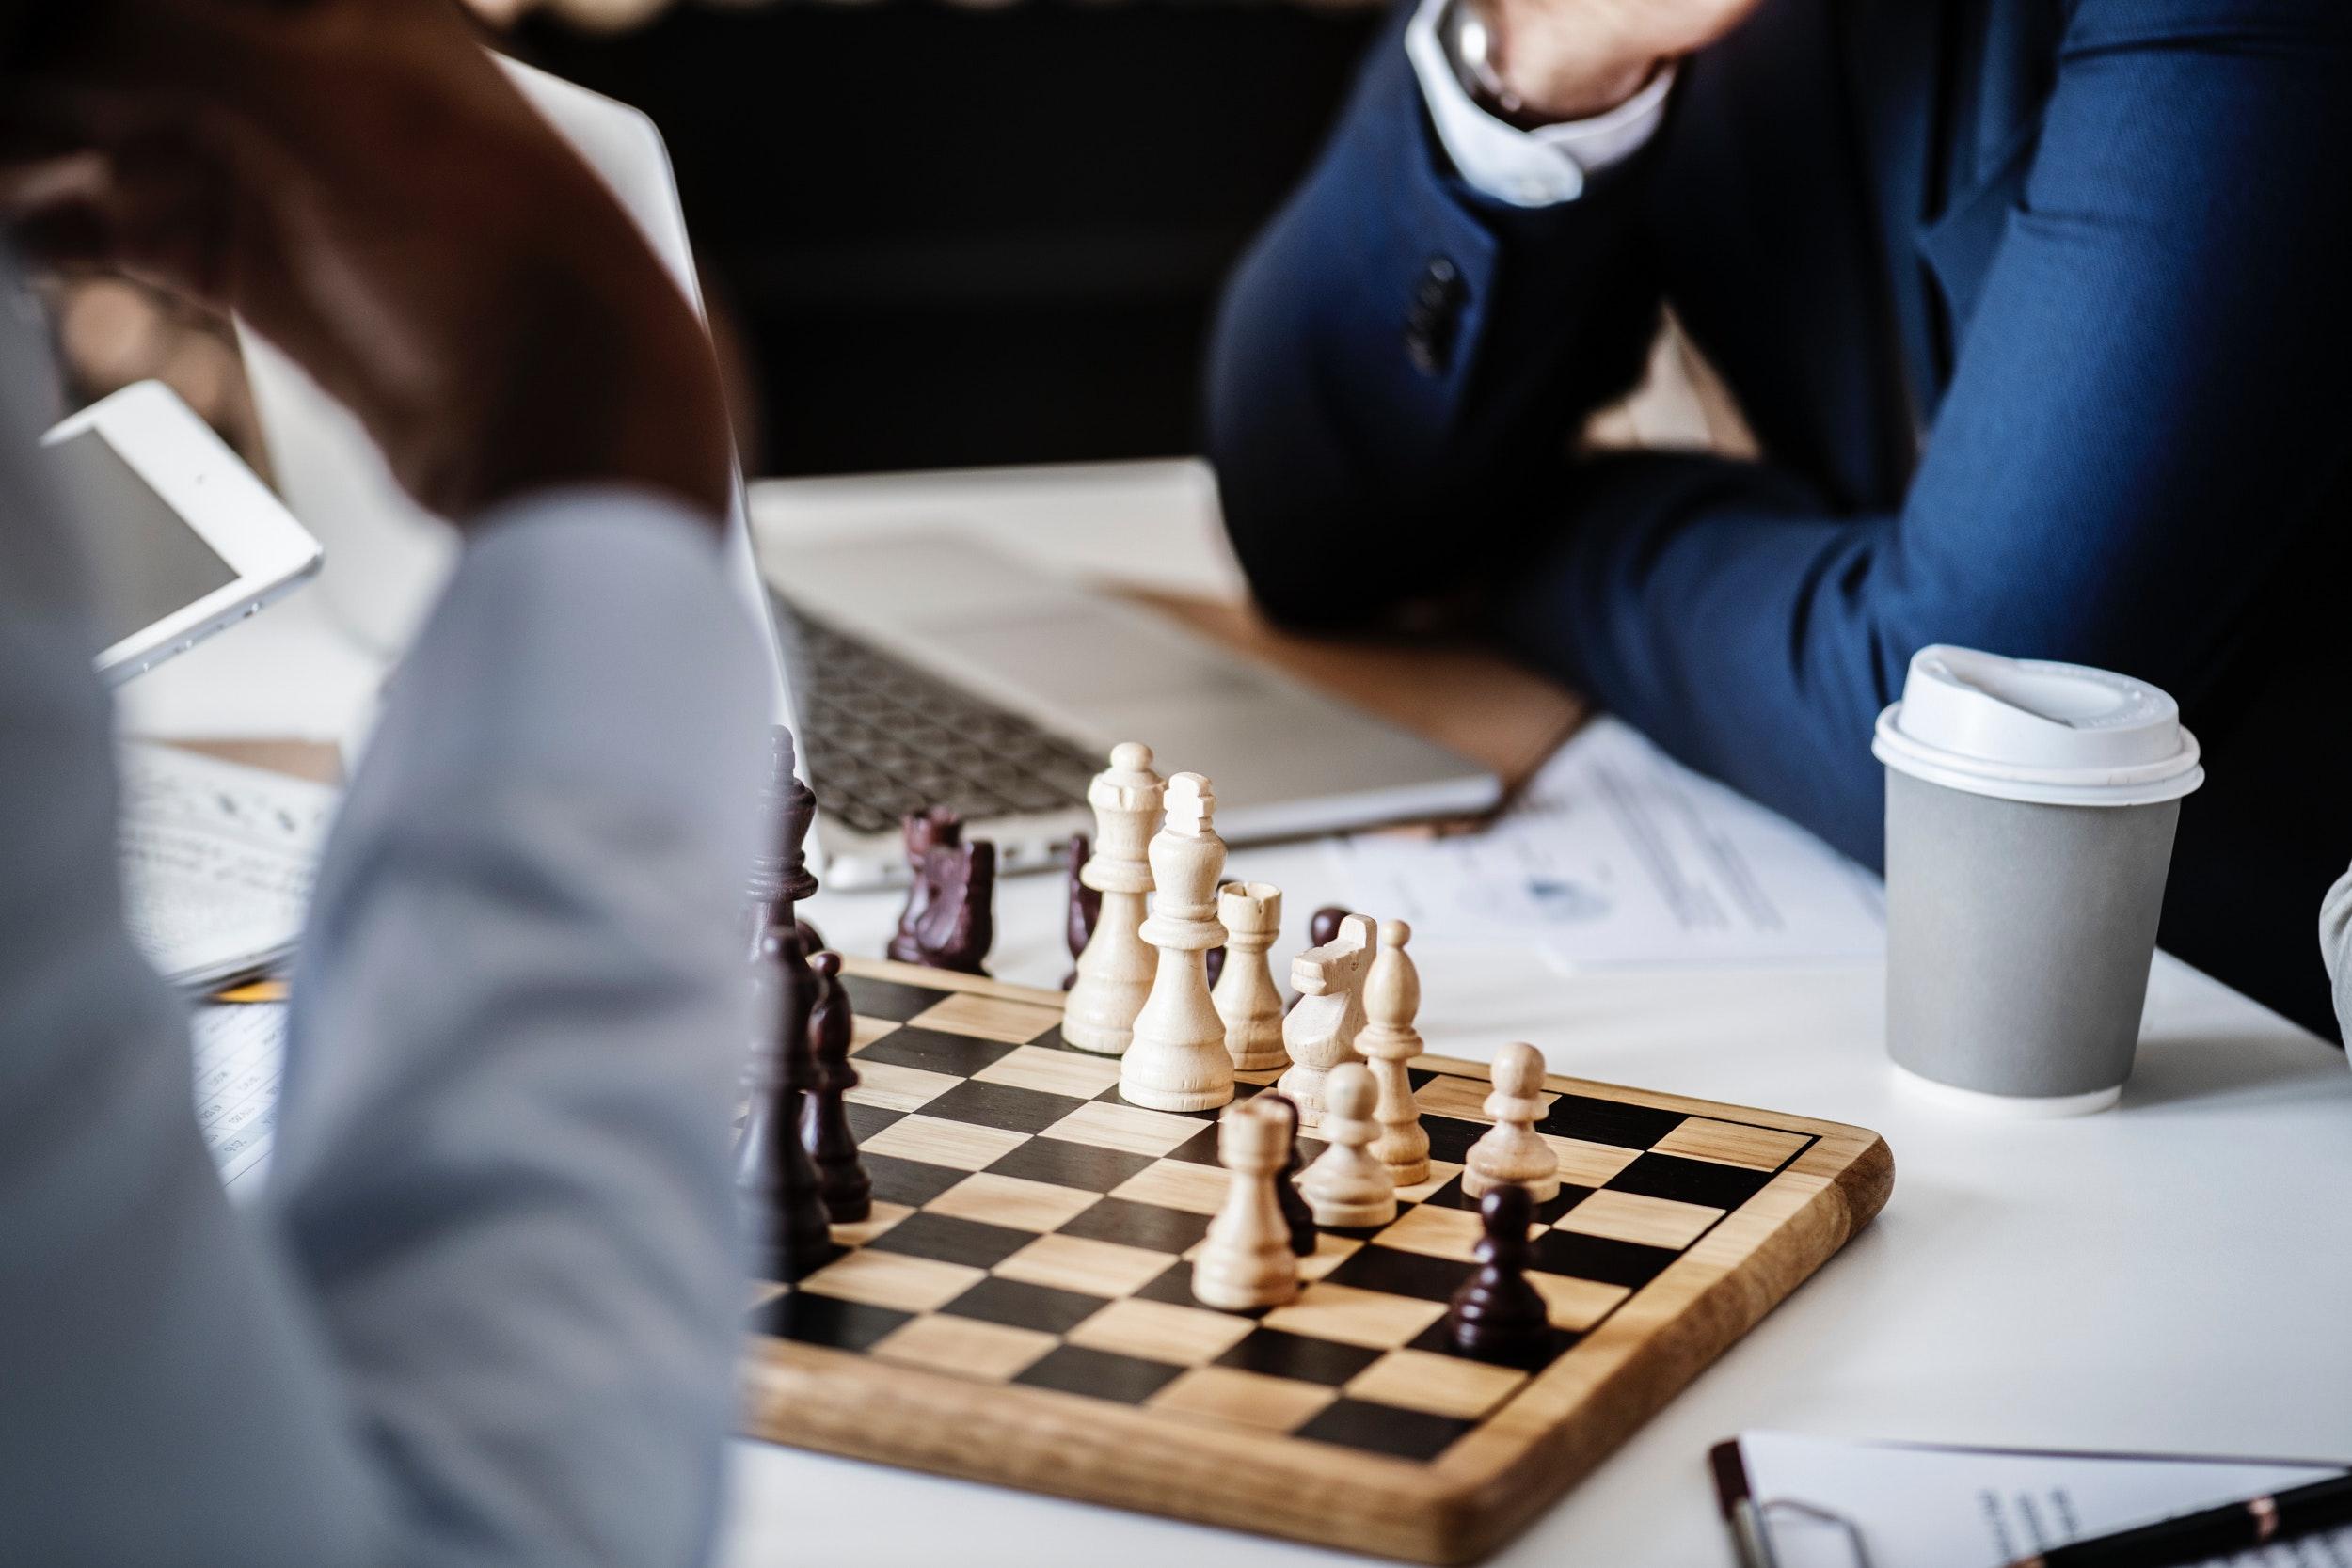 black-and-white-board-game-challenge-951229.jpg